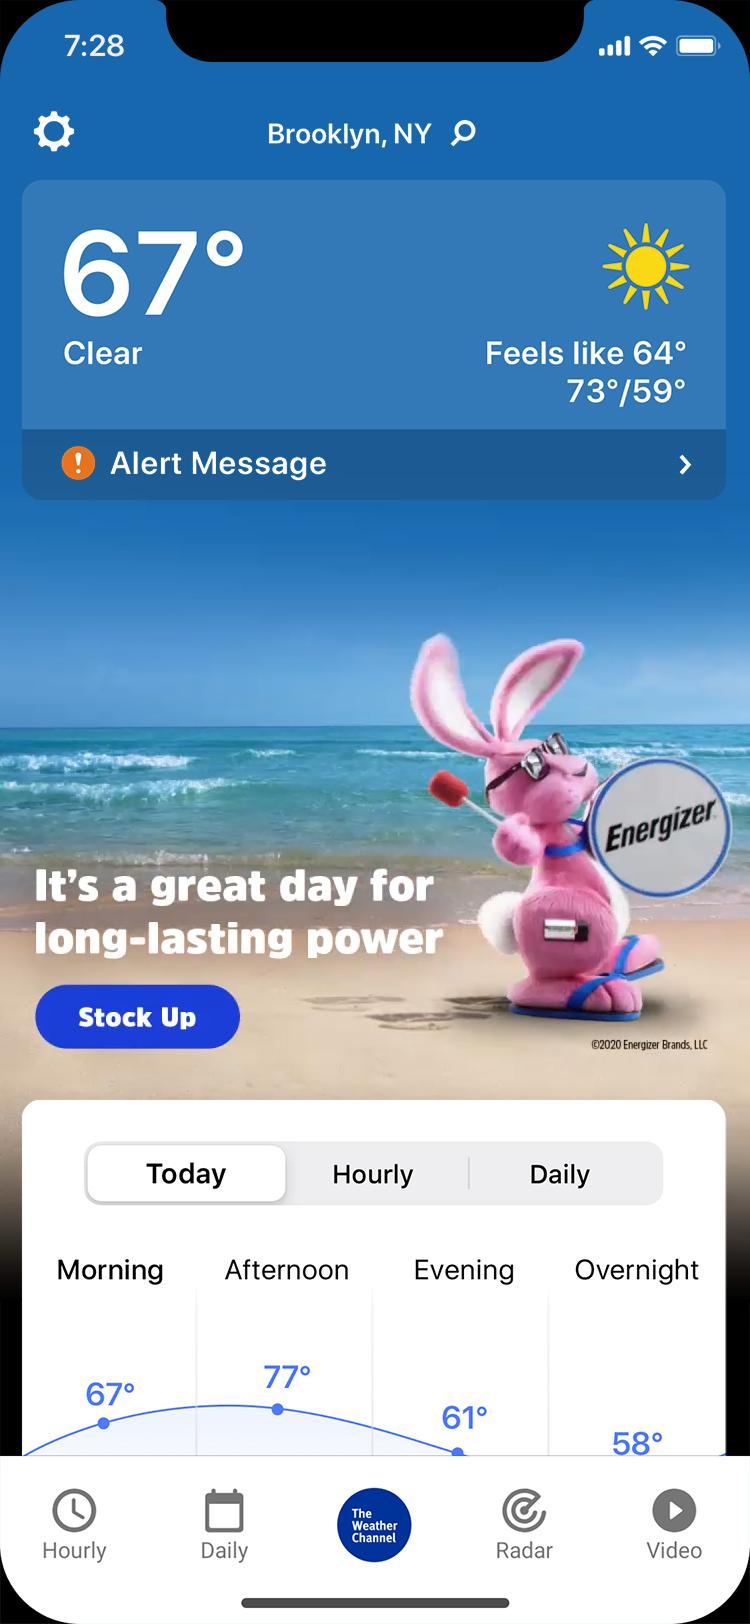 energizer-maim-clear-day